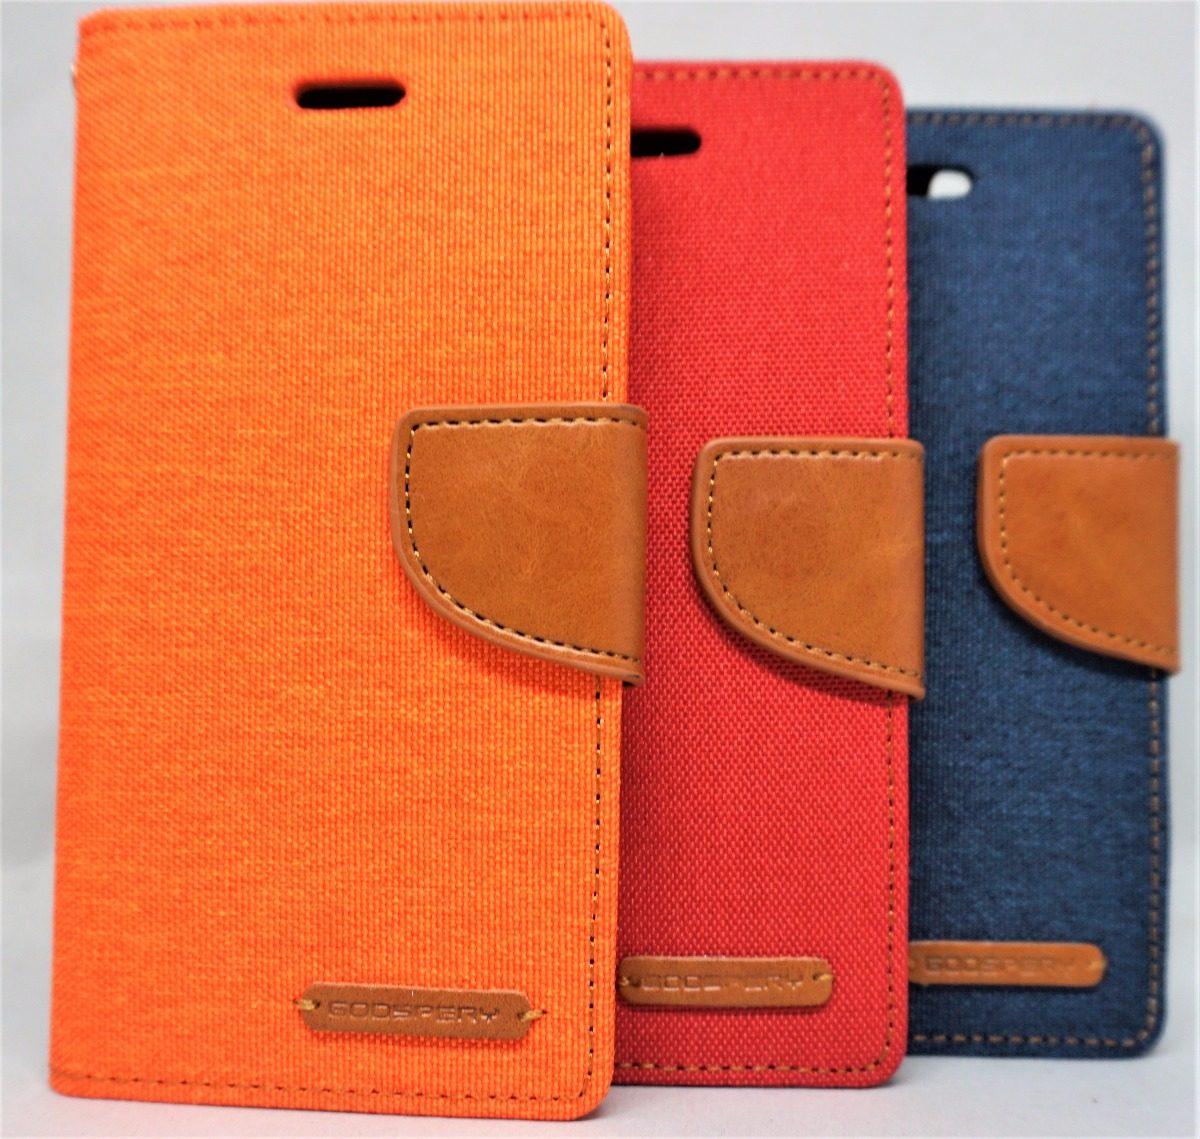 Mercury Goospery Canvas Diary Case For Iphone 6 Navy Spec Dan Samsung Galaxy S8 Red Funda 6s Cargando Zoom